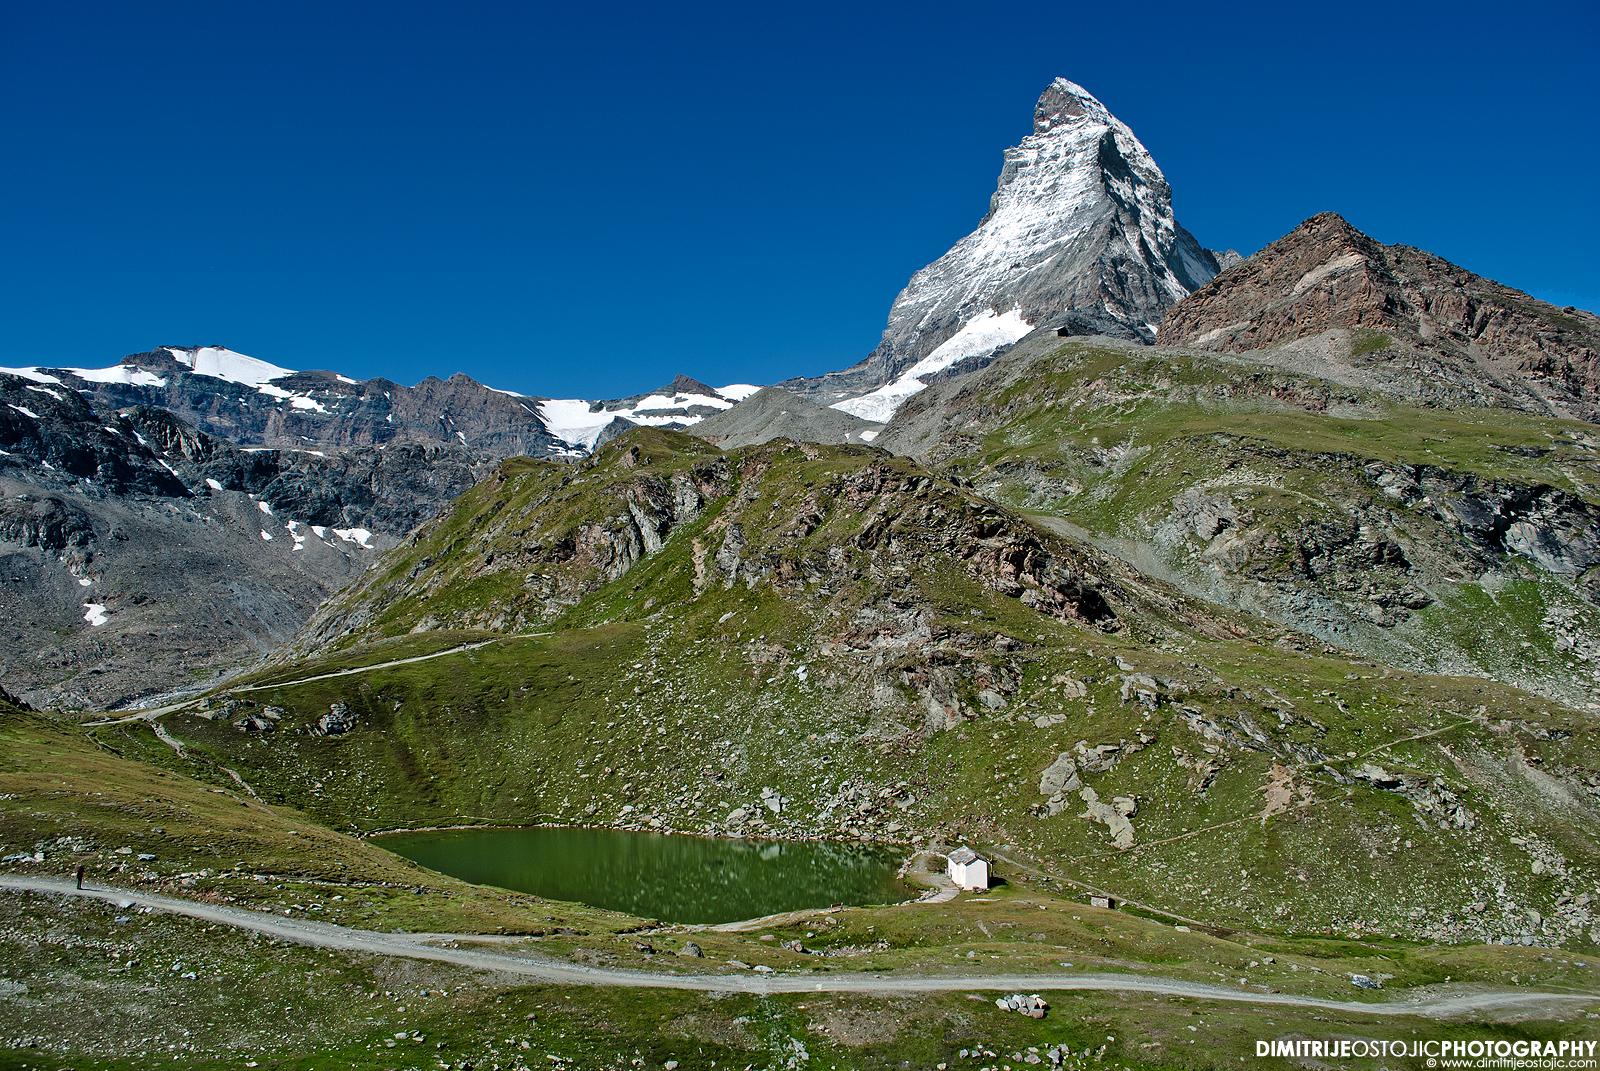 Matterhorn   Dimitrije Ostojic photo blog